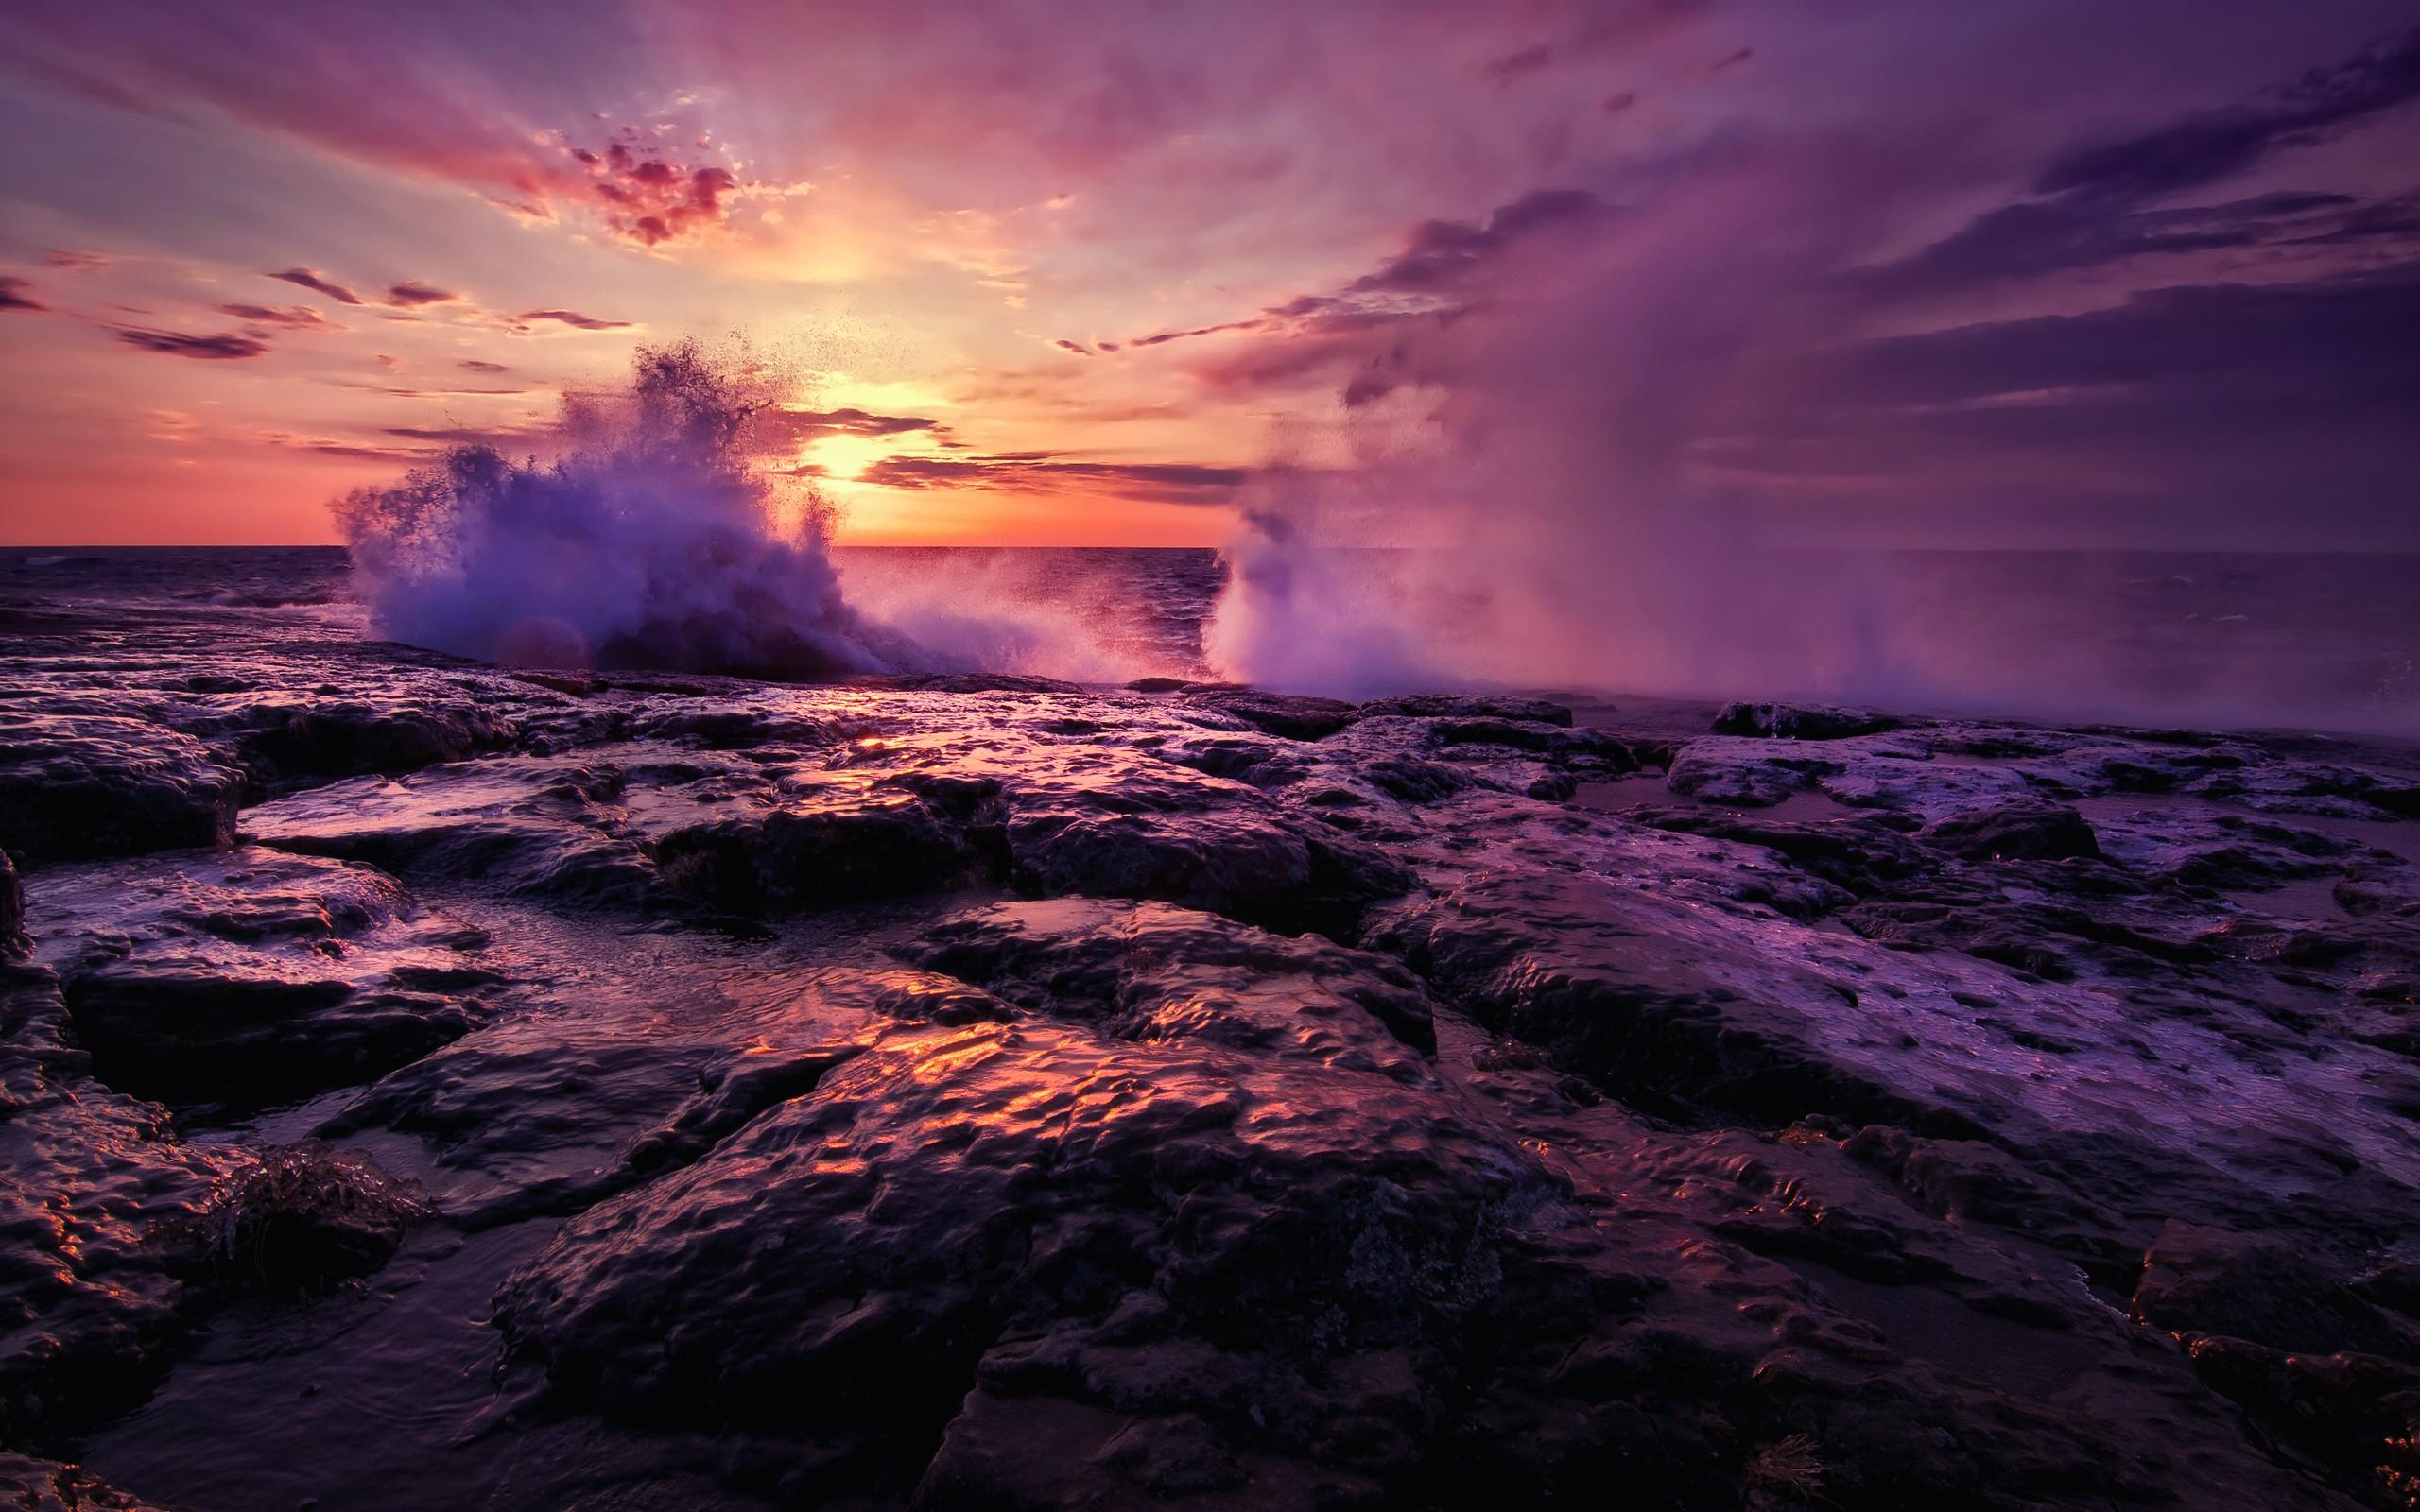 ocean waves sunset wallpapers ocean waves sunset wallpapers ocean 2560x1600